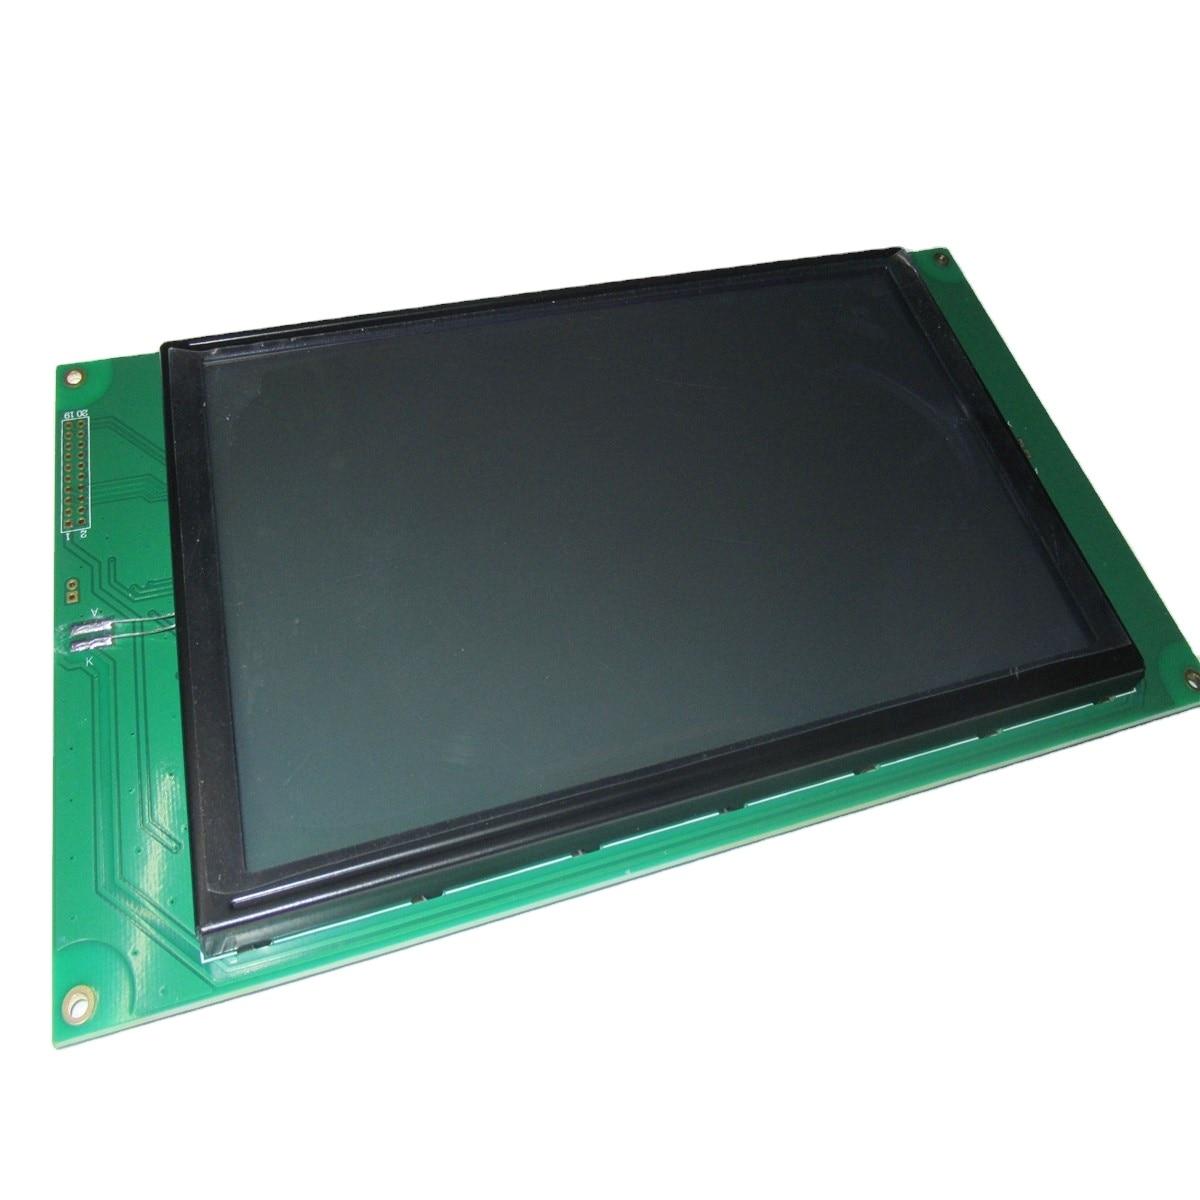 TLX-1301V-4113A TLX-1301V-30 شاشة الكريستال السائل لوحة الشاشة شاشات الكريستال السائل